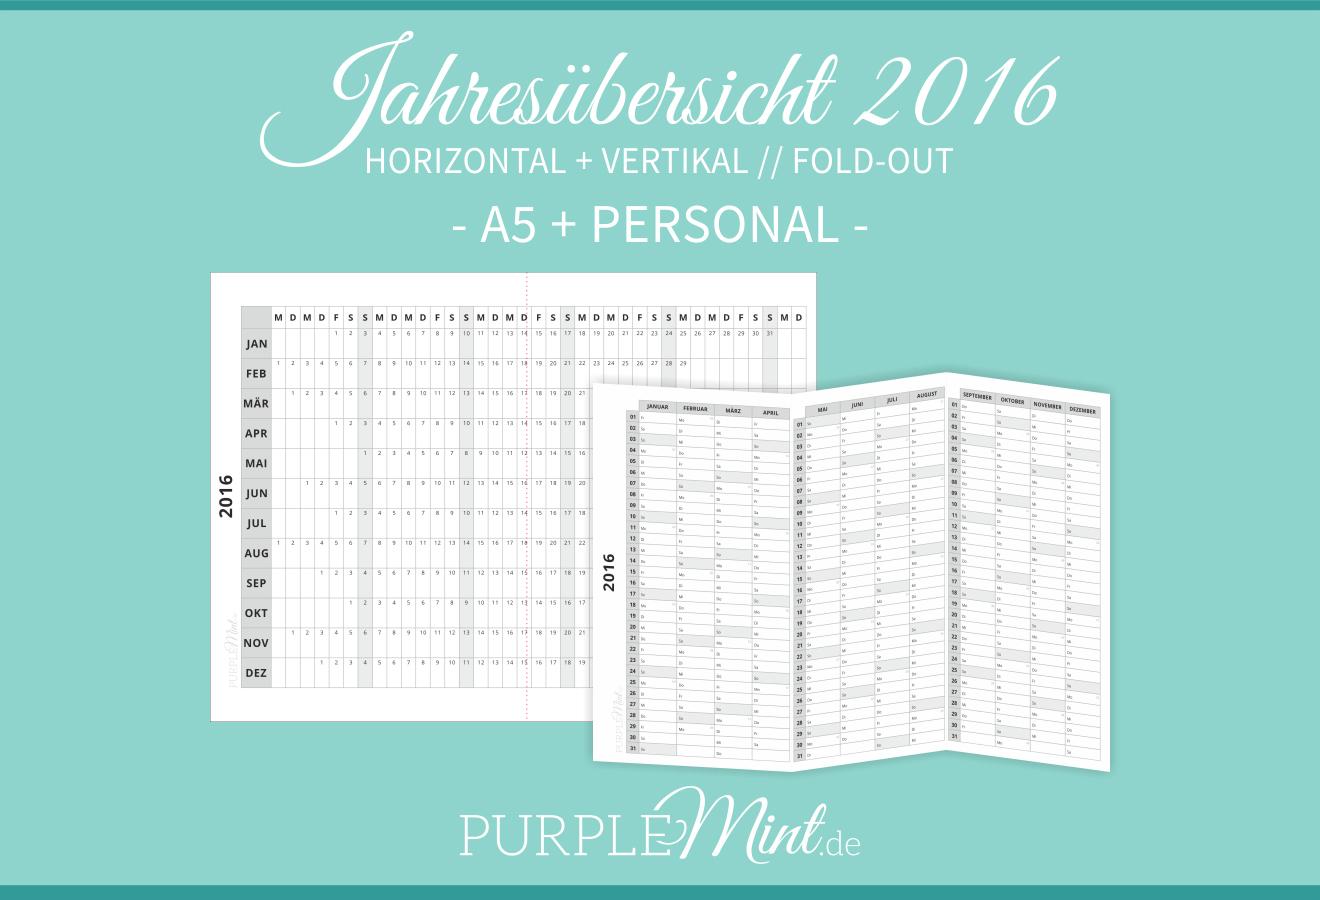 Kalender - Fold-out Jahresübersicht 2016 - A5 + Personal - Filofax / Kikki-k